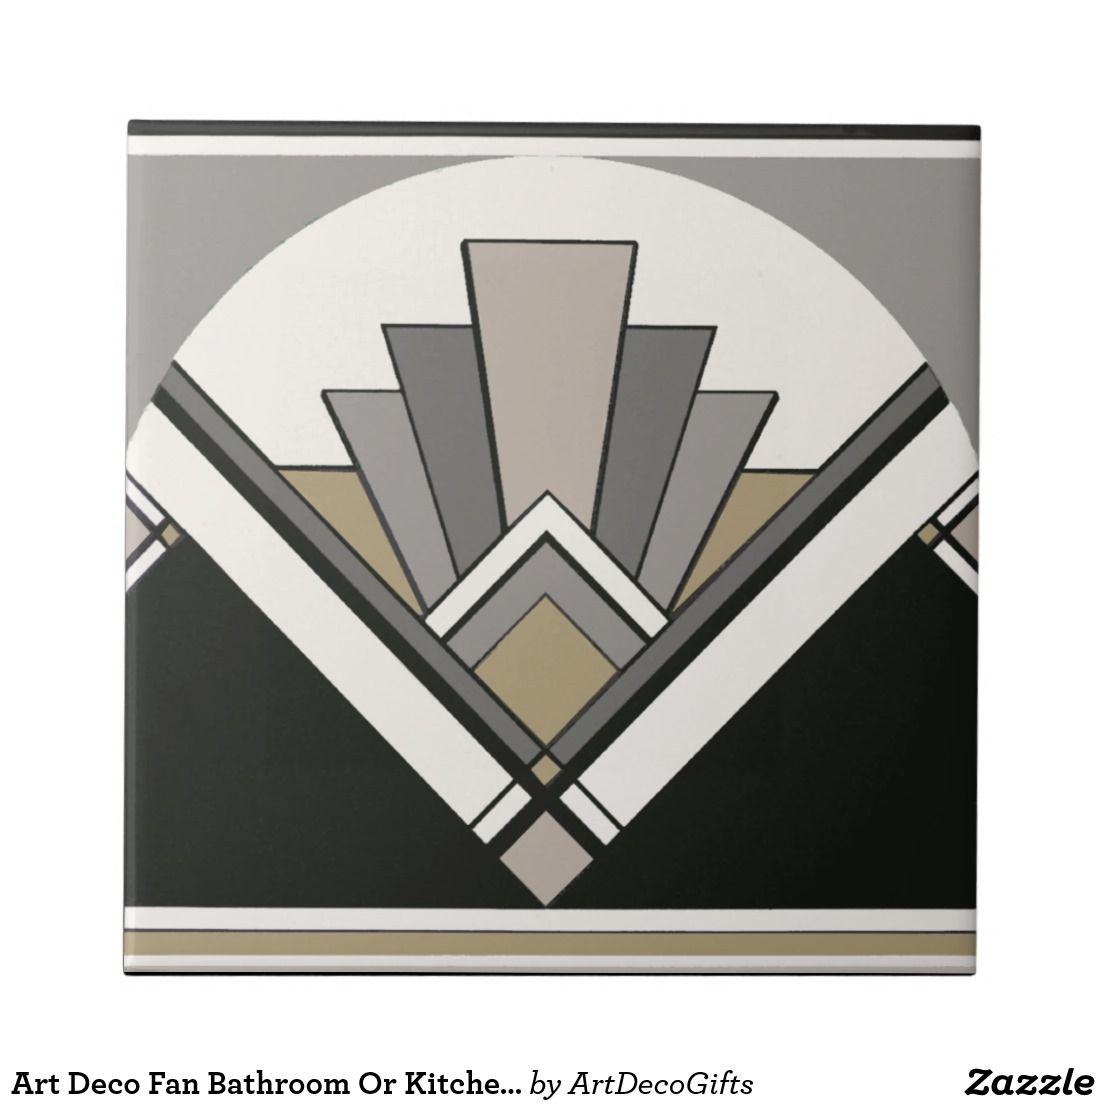 Art Deco Fan Bathroom Or Kitchen Tile | Zazzle.com